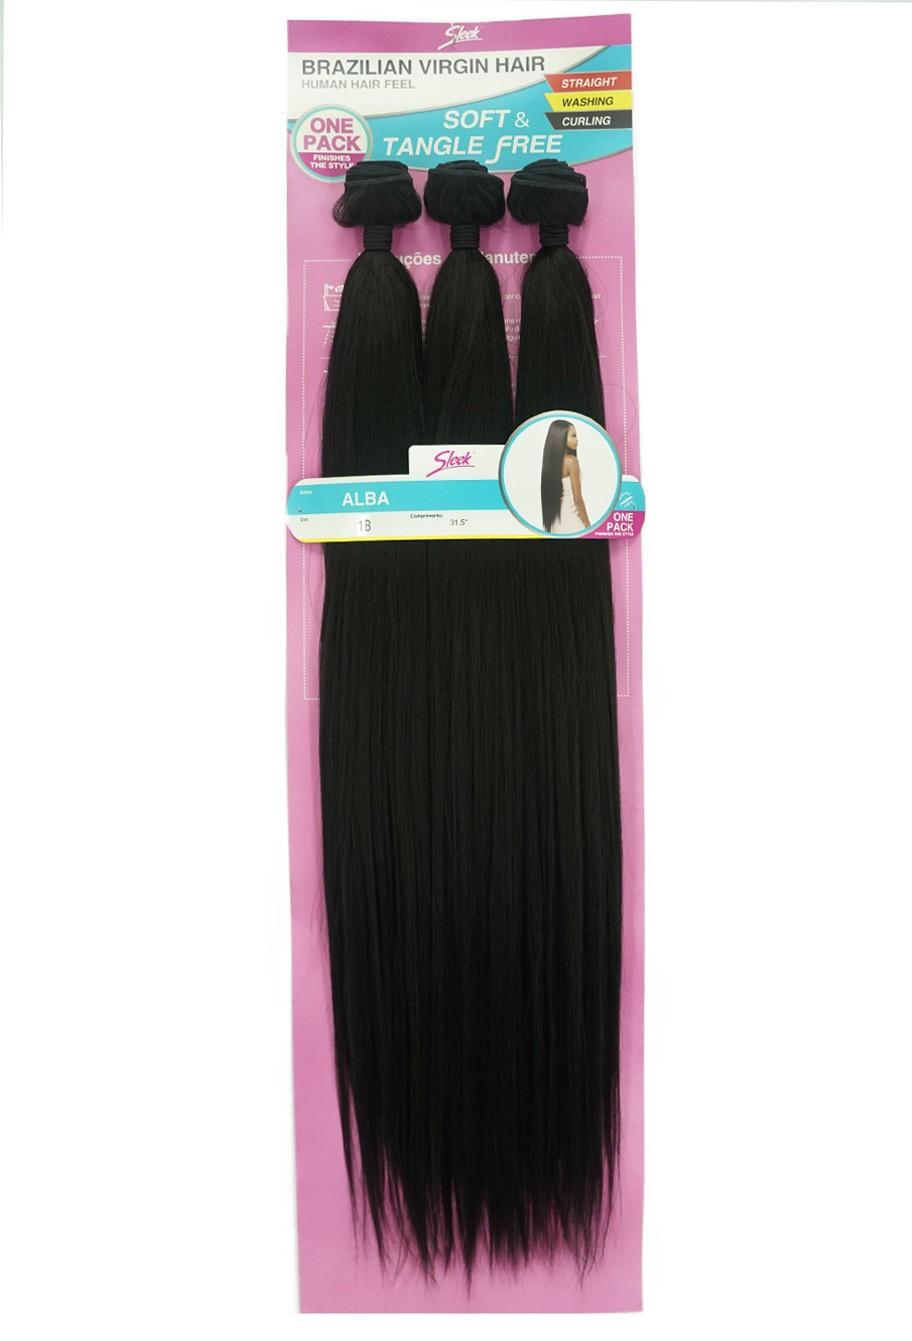 Cabelo Bio Vegetal - Sleek Brazilian Virgin Hair - Alba